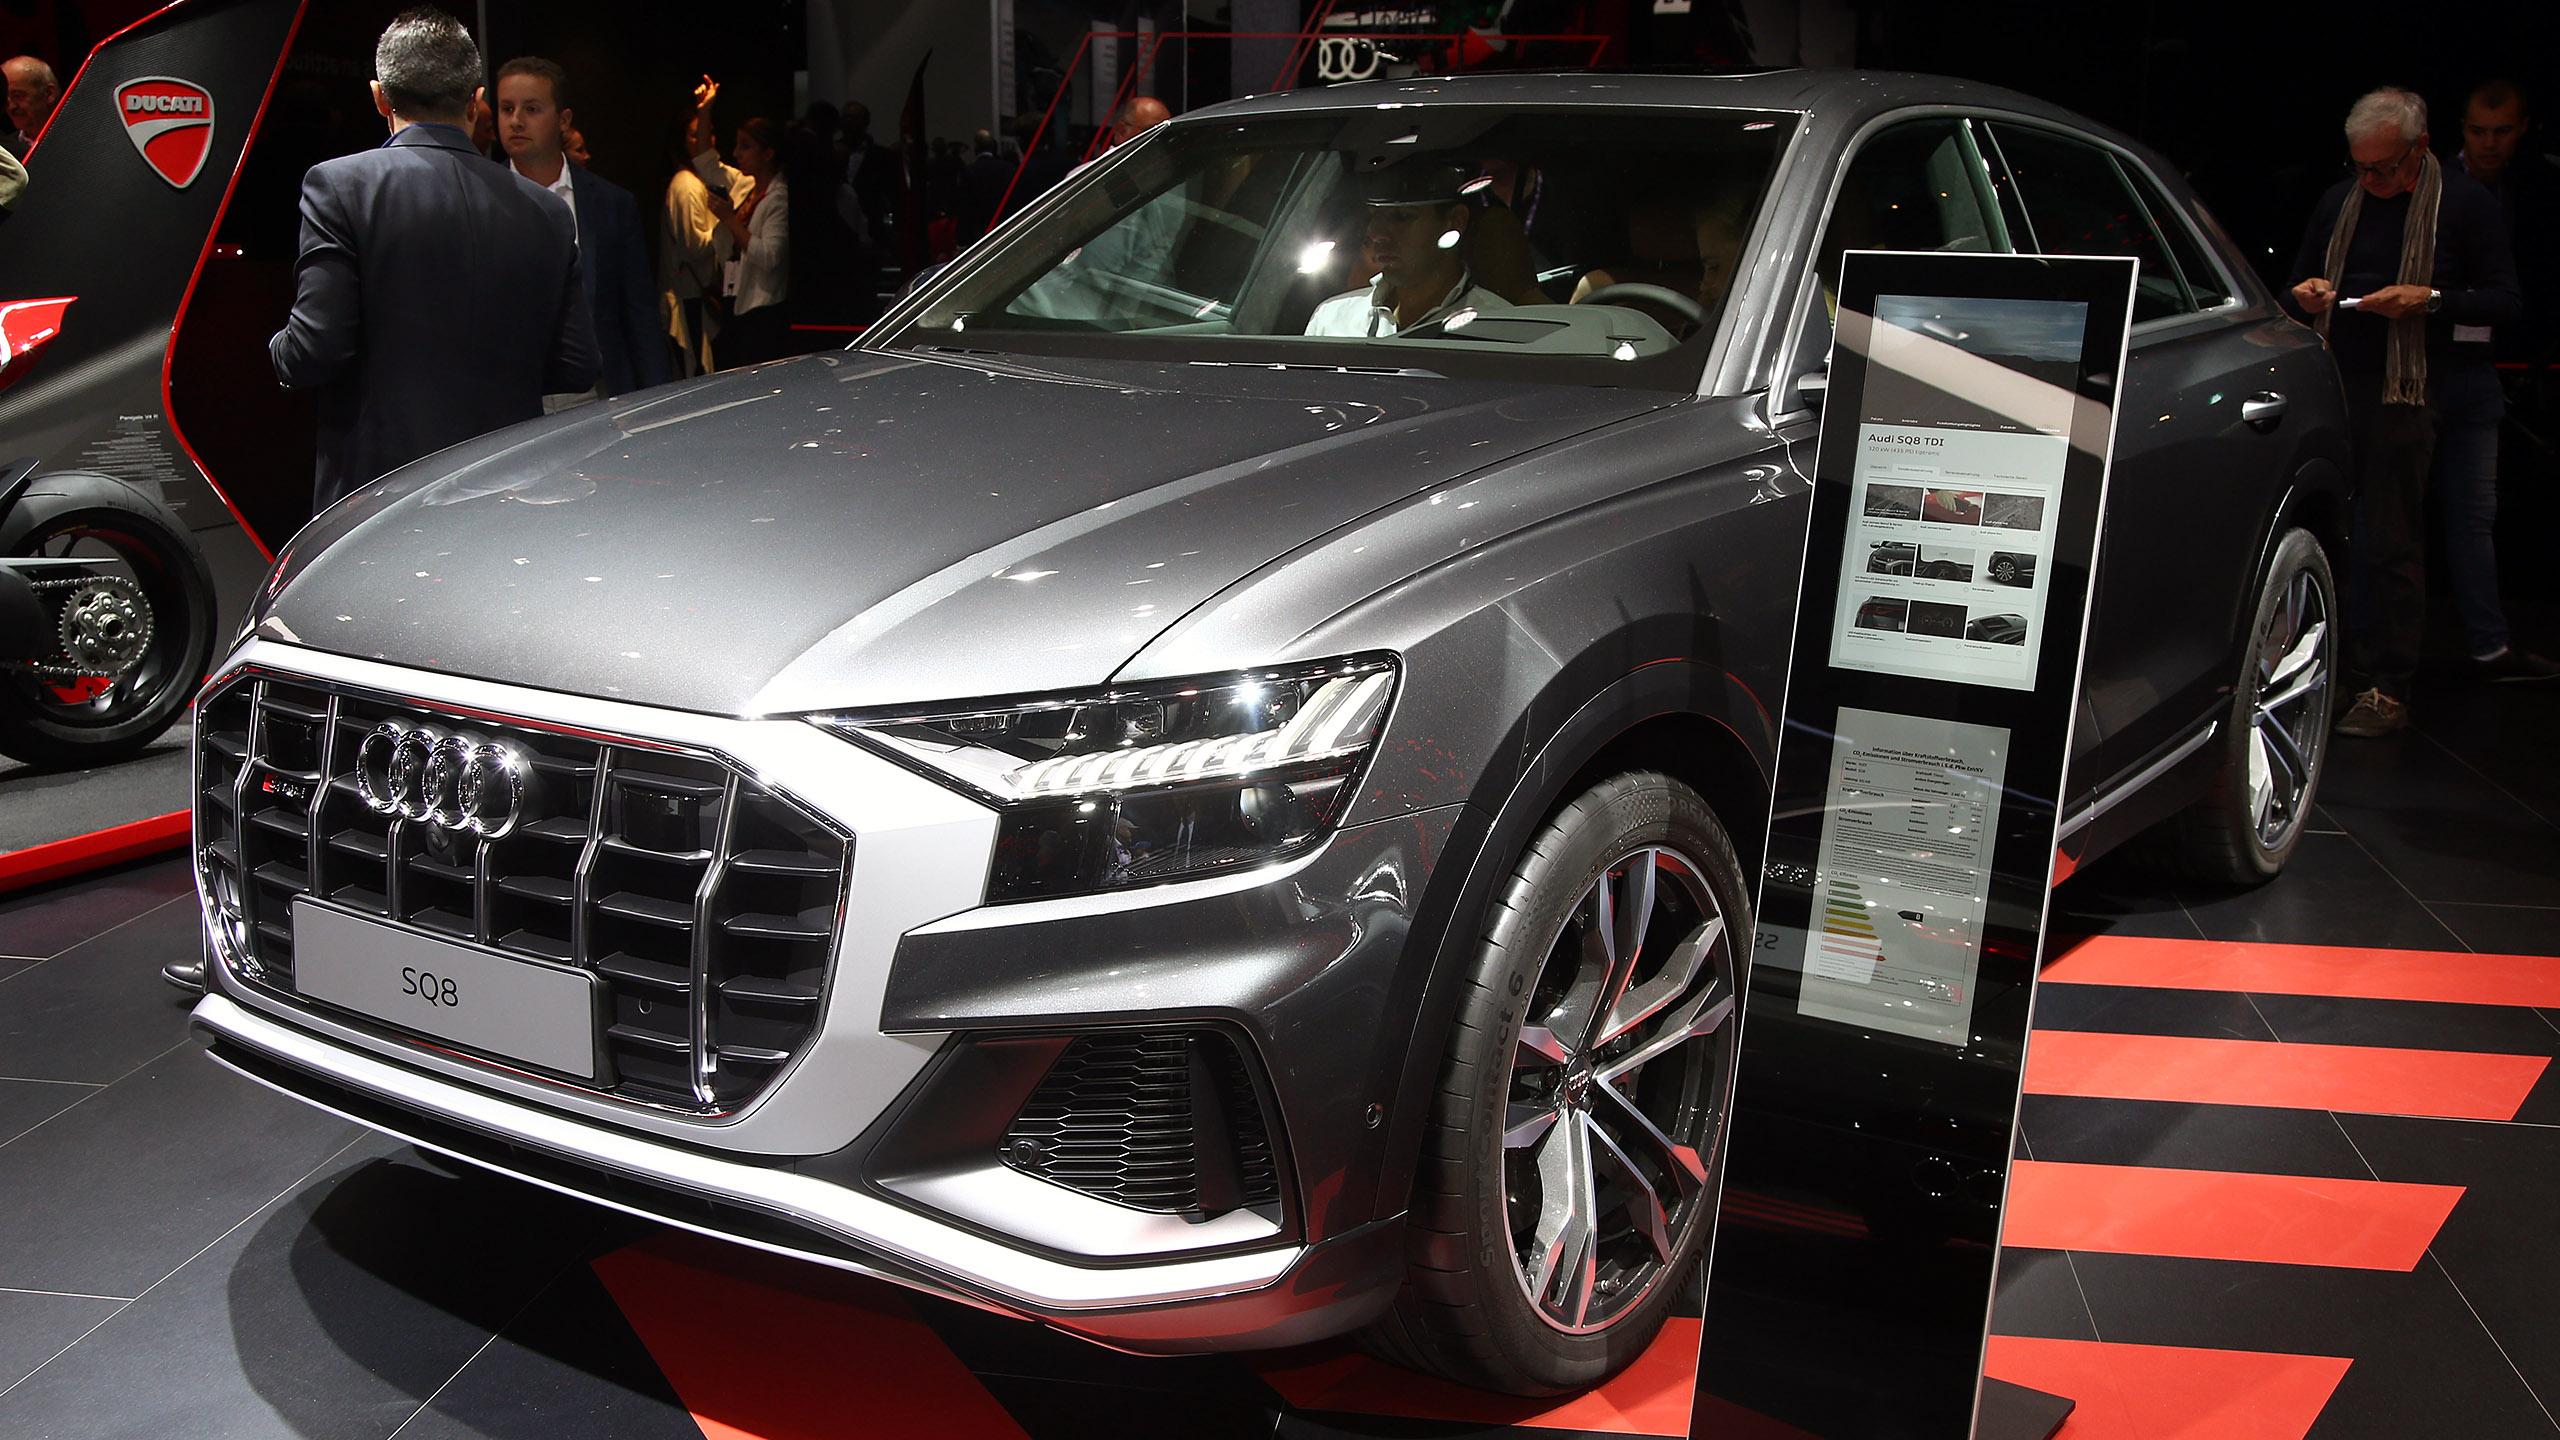 Kelebihan Kekurangan Audi Sq8 2019 Murah Berkualitas